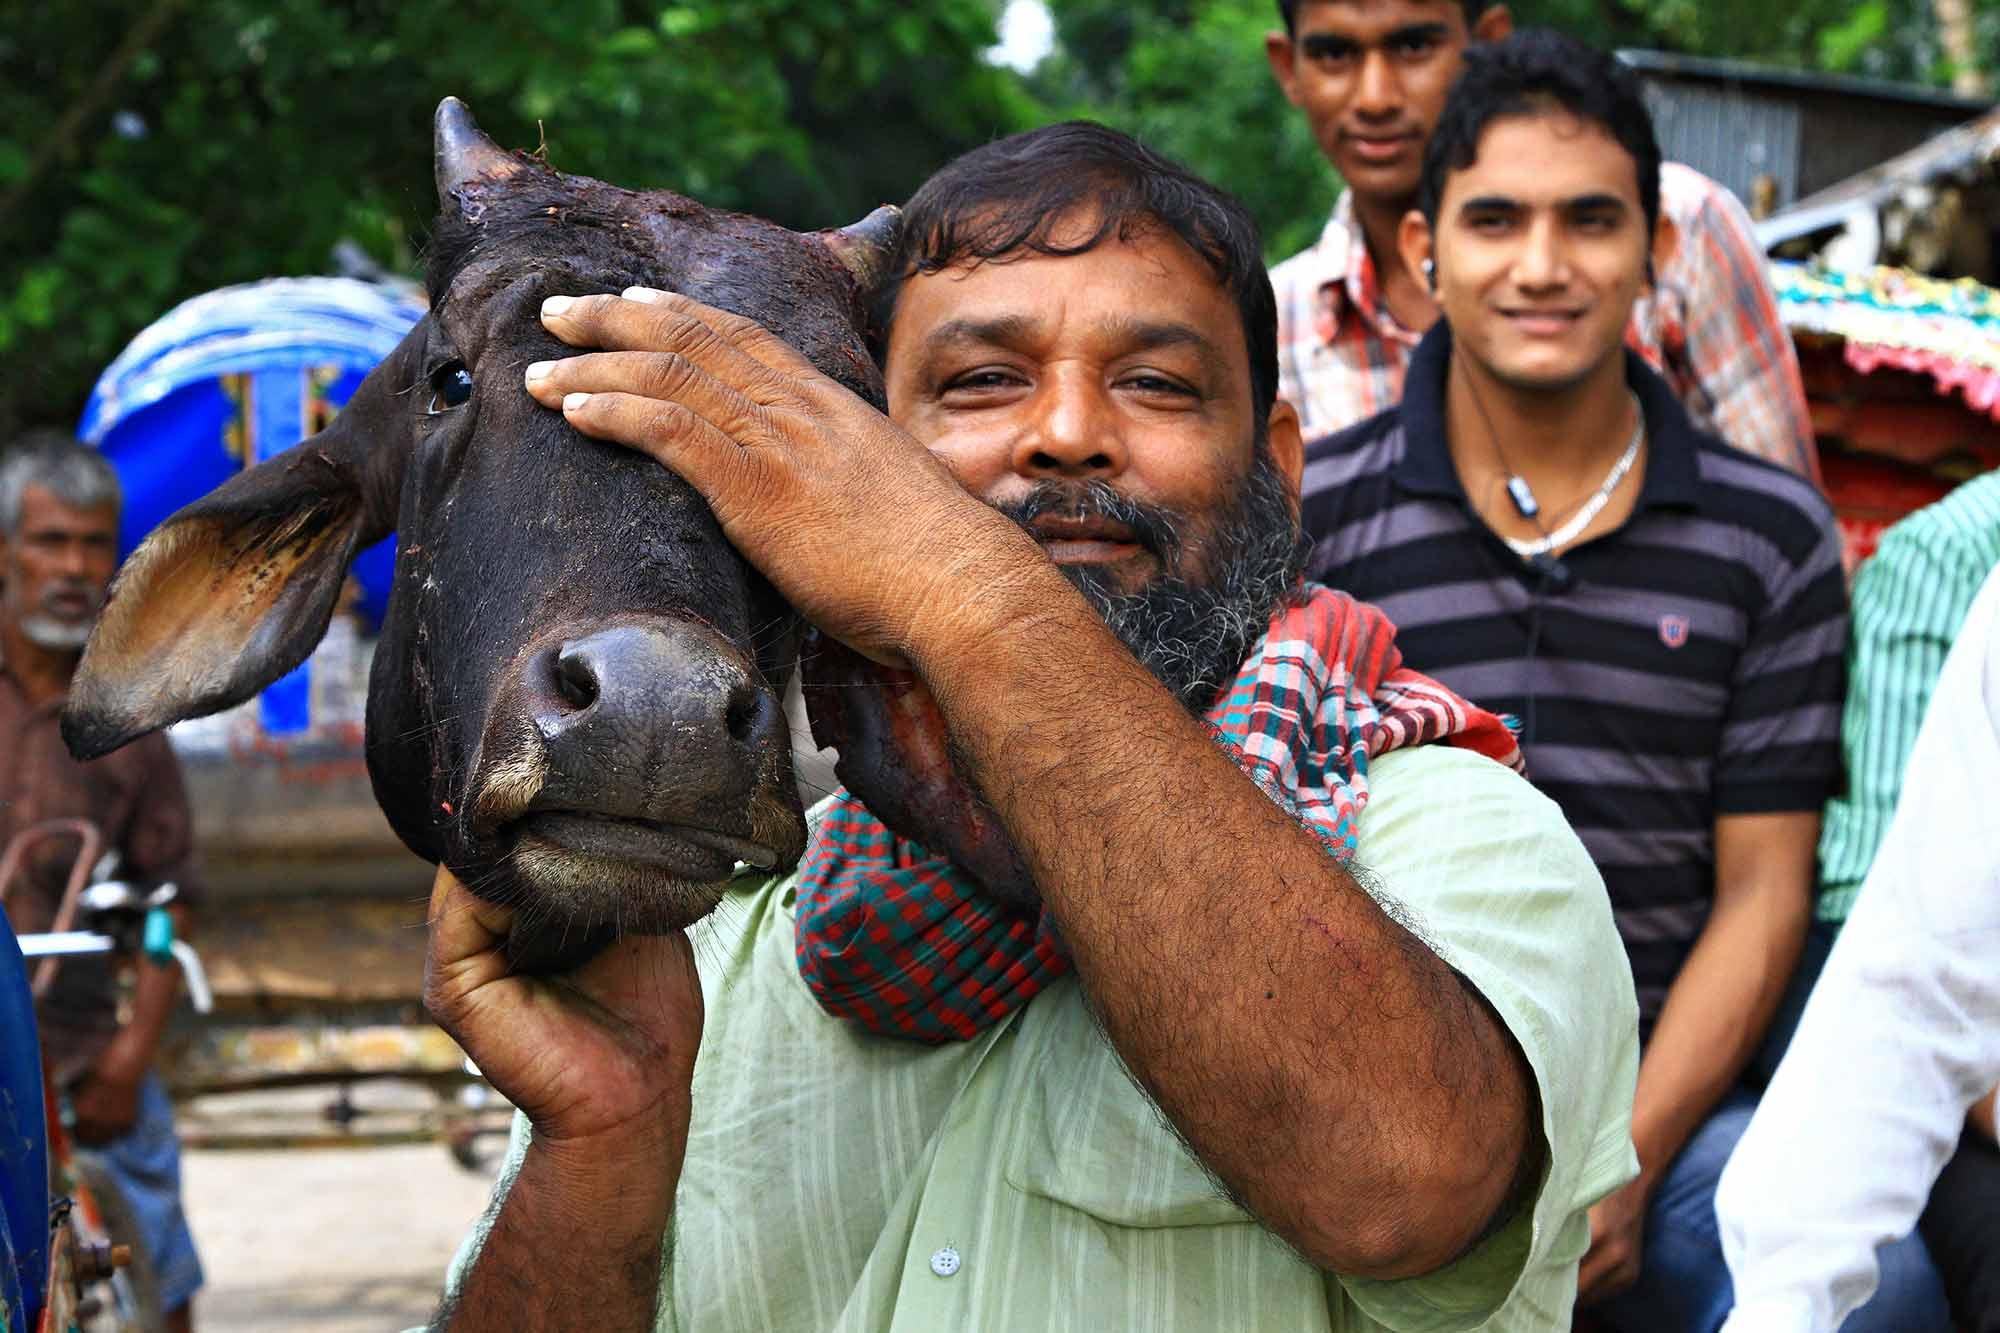 A man with a bull's head in Dhaka, Bangladesh. © Ulli Maier & Nisa Maier